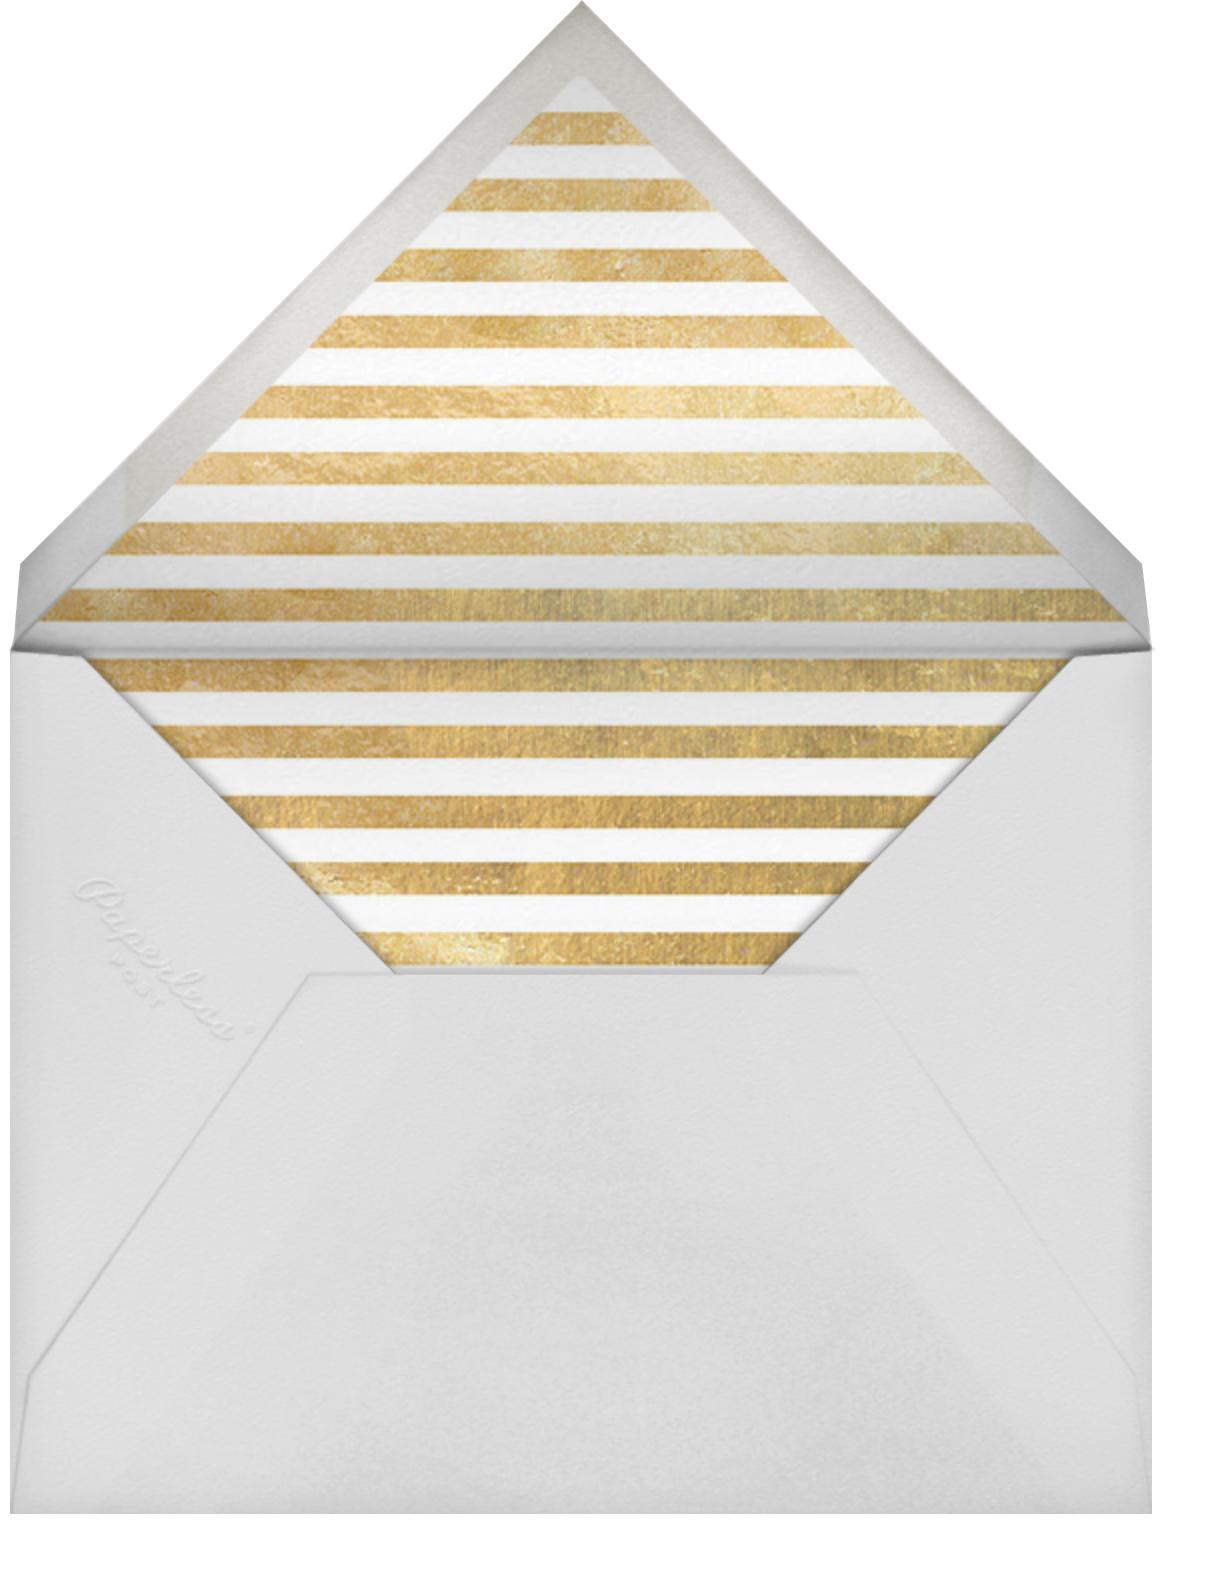 Pop Fizz Clink! (Horizontal) - kate spade new york - Adult birthday - envelope back